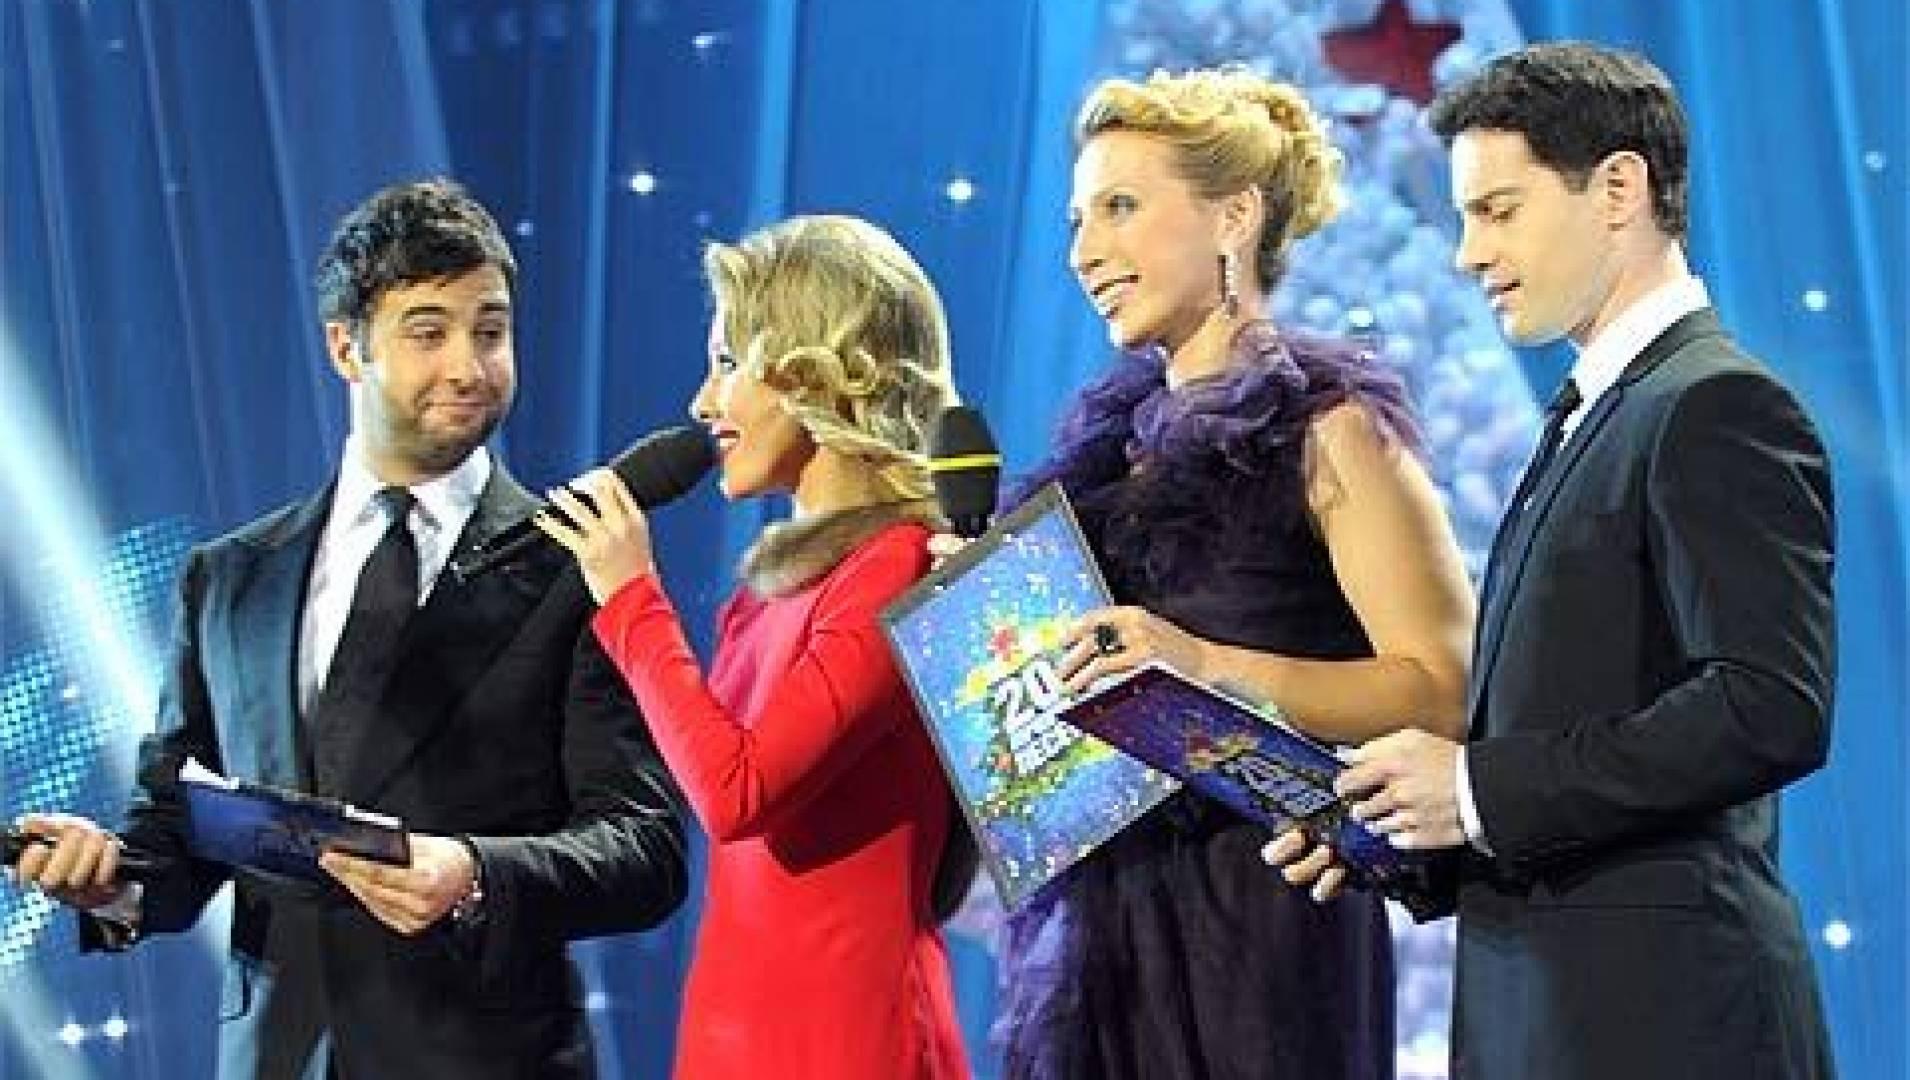 «Красная звезда». 20 лучших песен 2011 года - Музыкальная, Программа